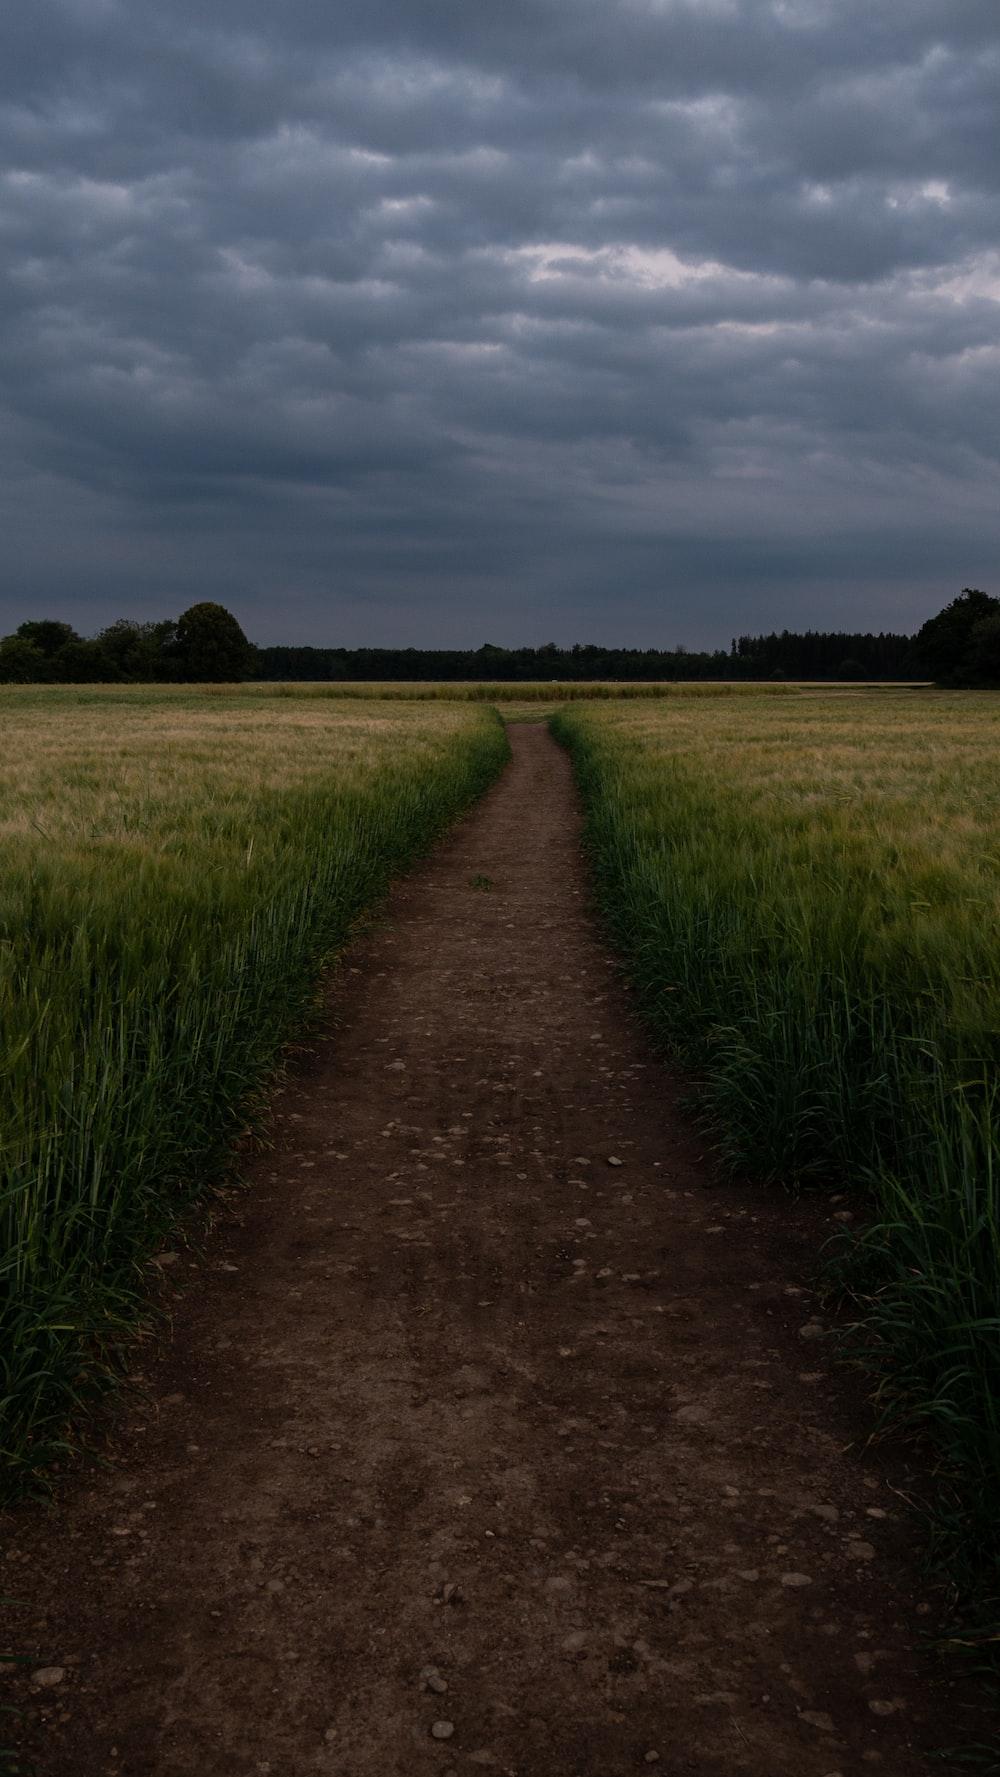 narrow pathway between wheat field